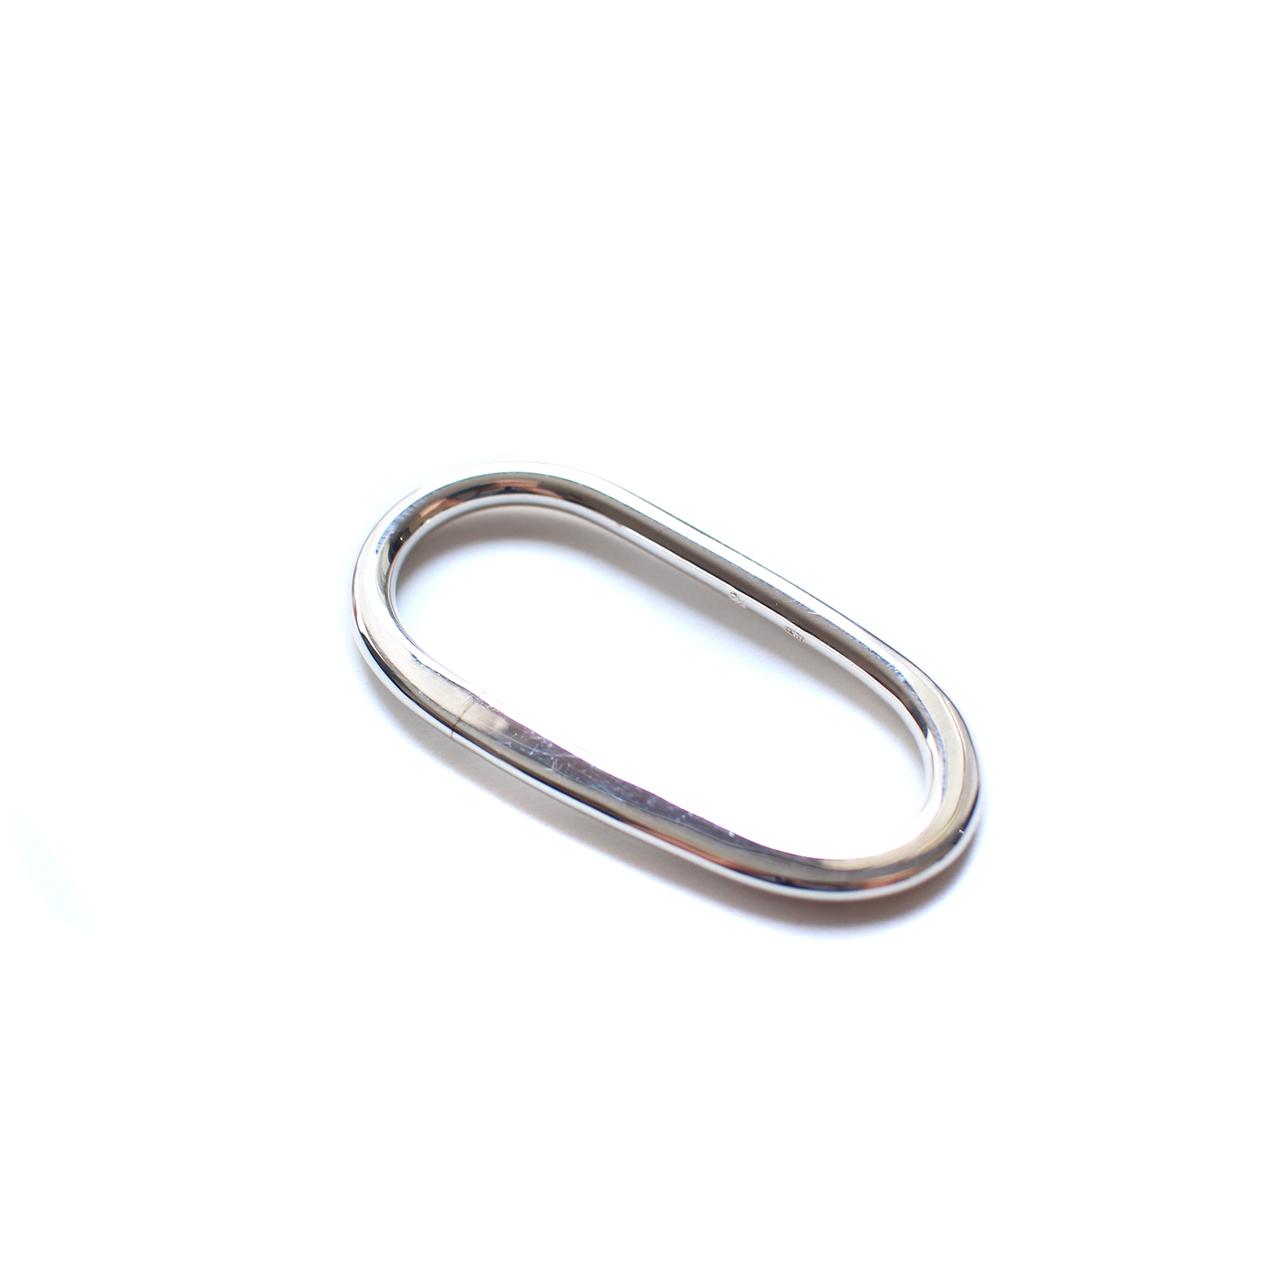 Restraint Ring